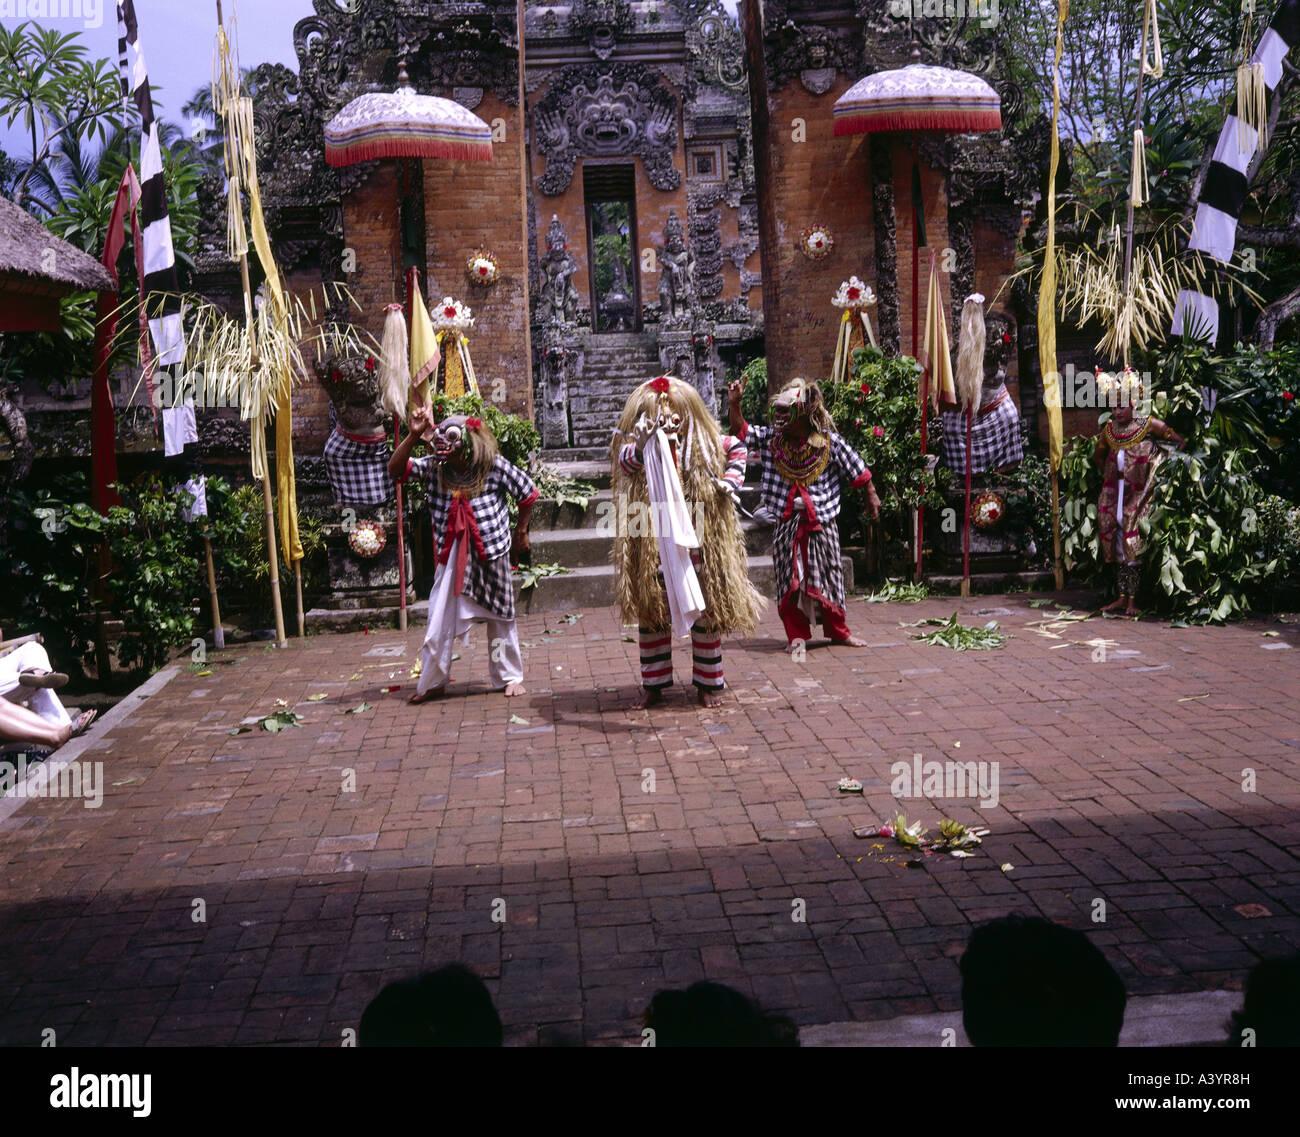 Billet /géographie, INDONÉSIE, Bali, tradition / folklore, danse Barong, apparition de Rangda, en Asie Photo Stock